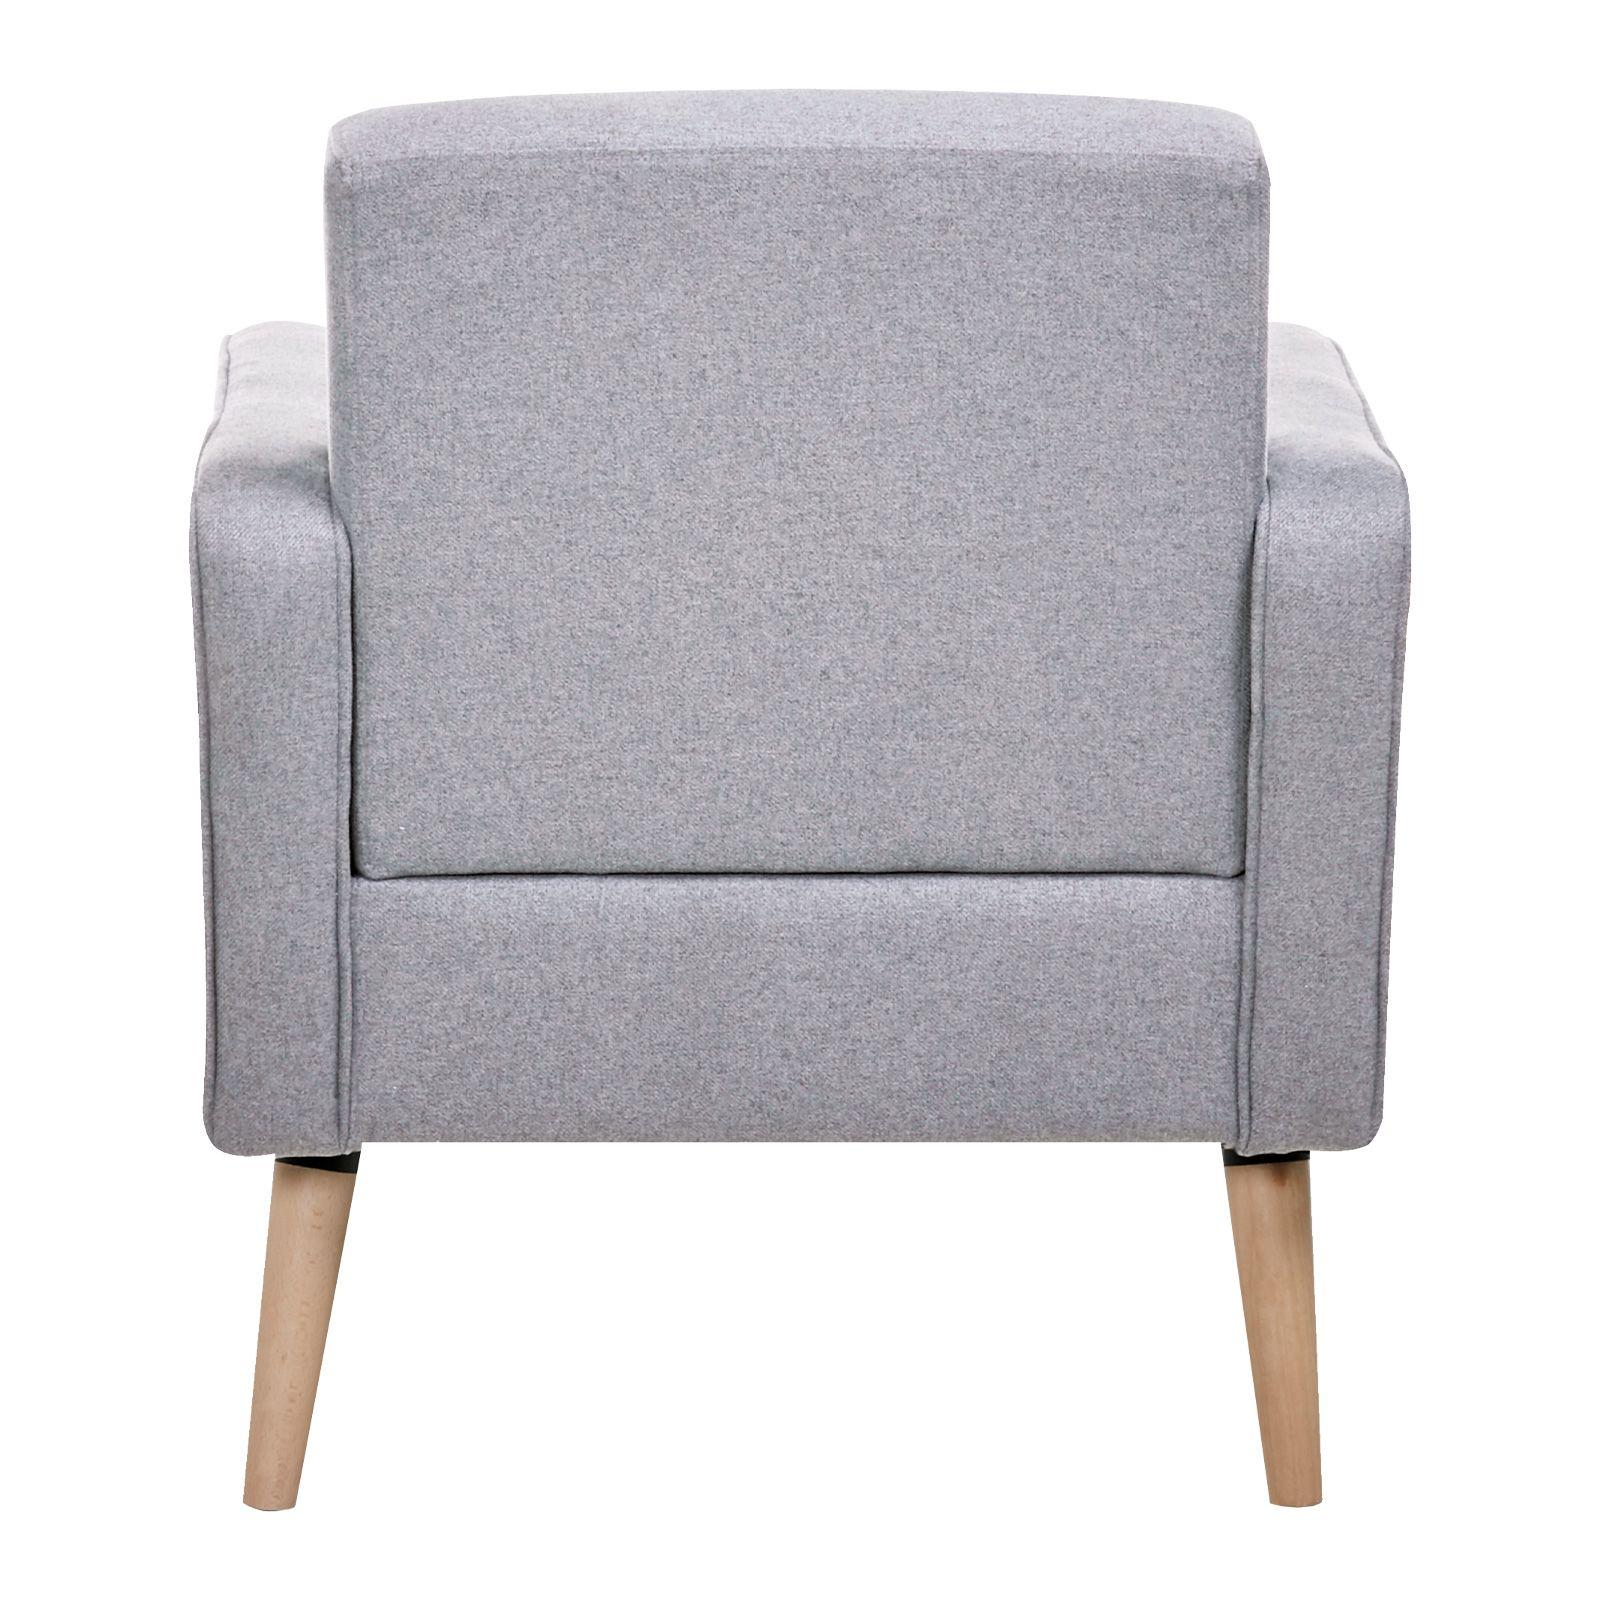 NOYAZU | Sillón tapizado gris (70 x 77 x 77 cm)